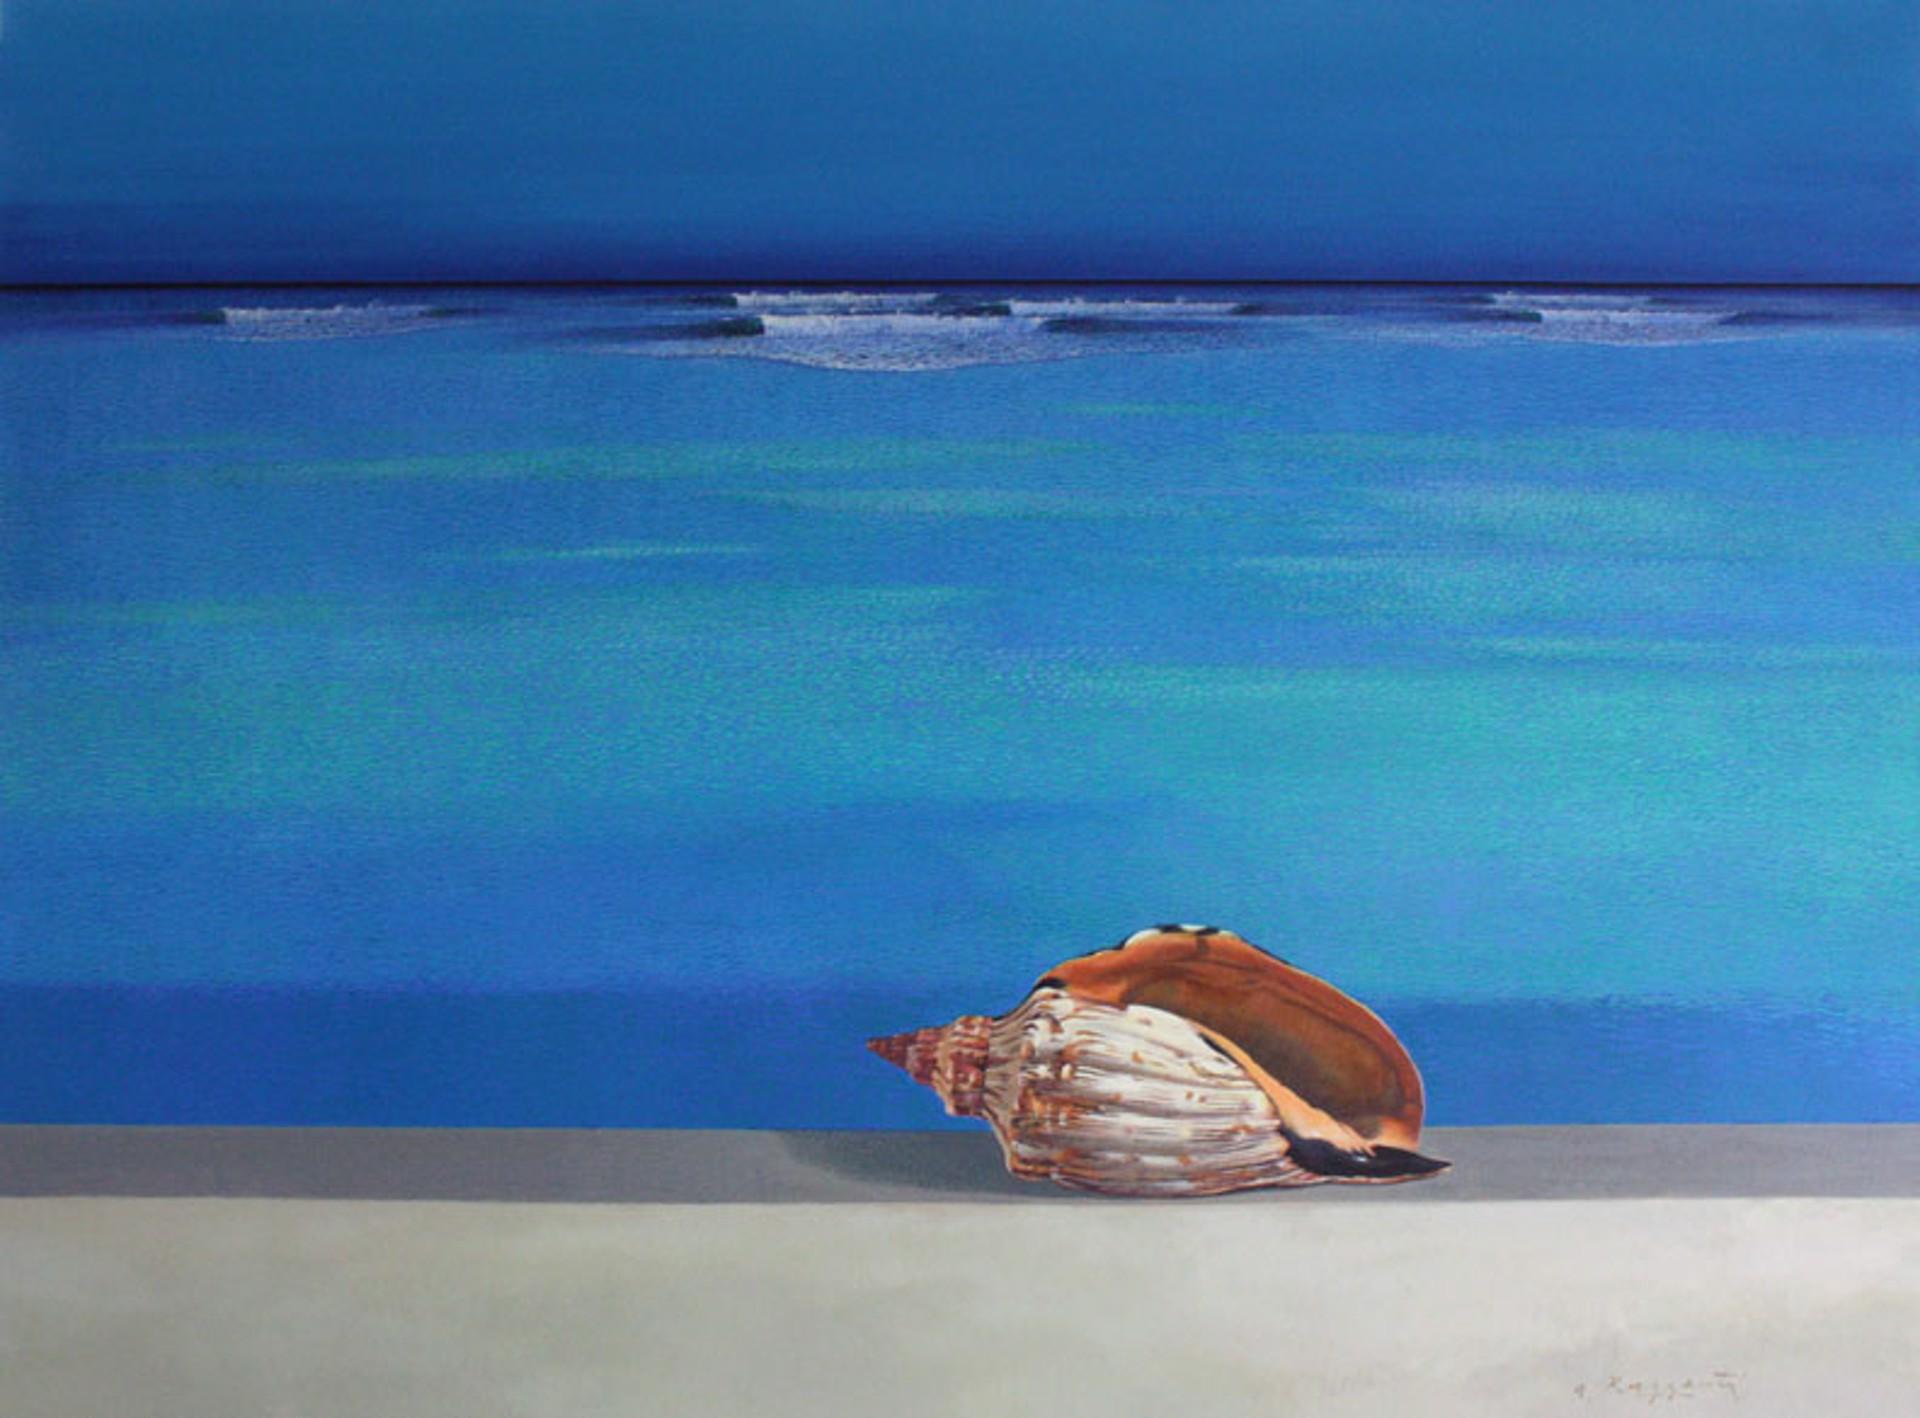 Sound Of The Ocean by Andrea Razzauti